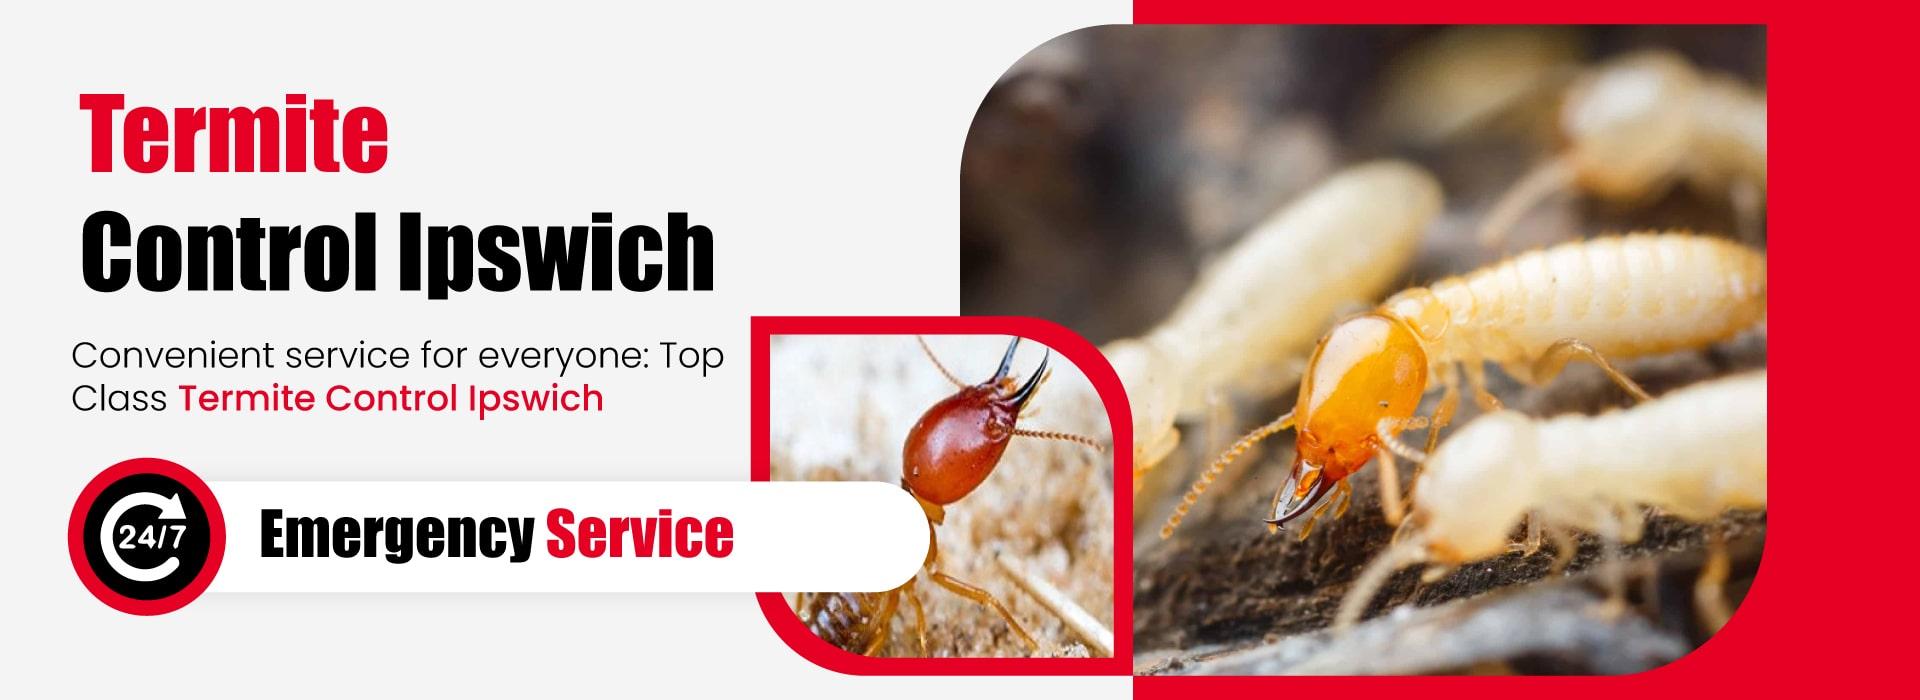 Termite-Control-Ipswich-1